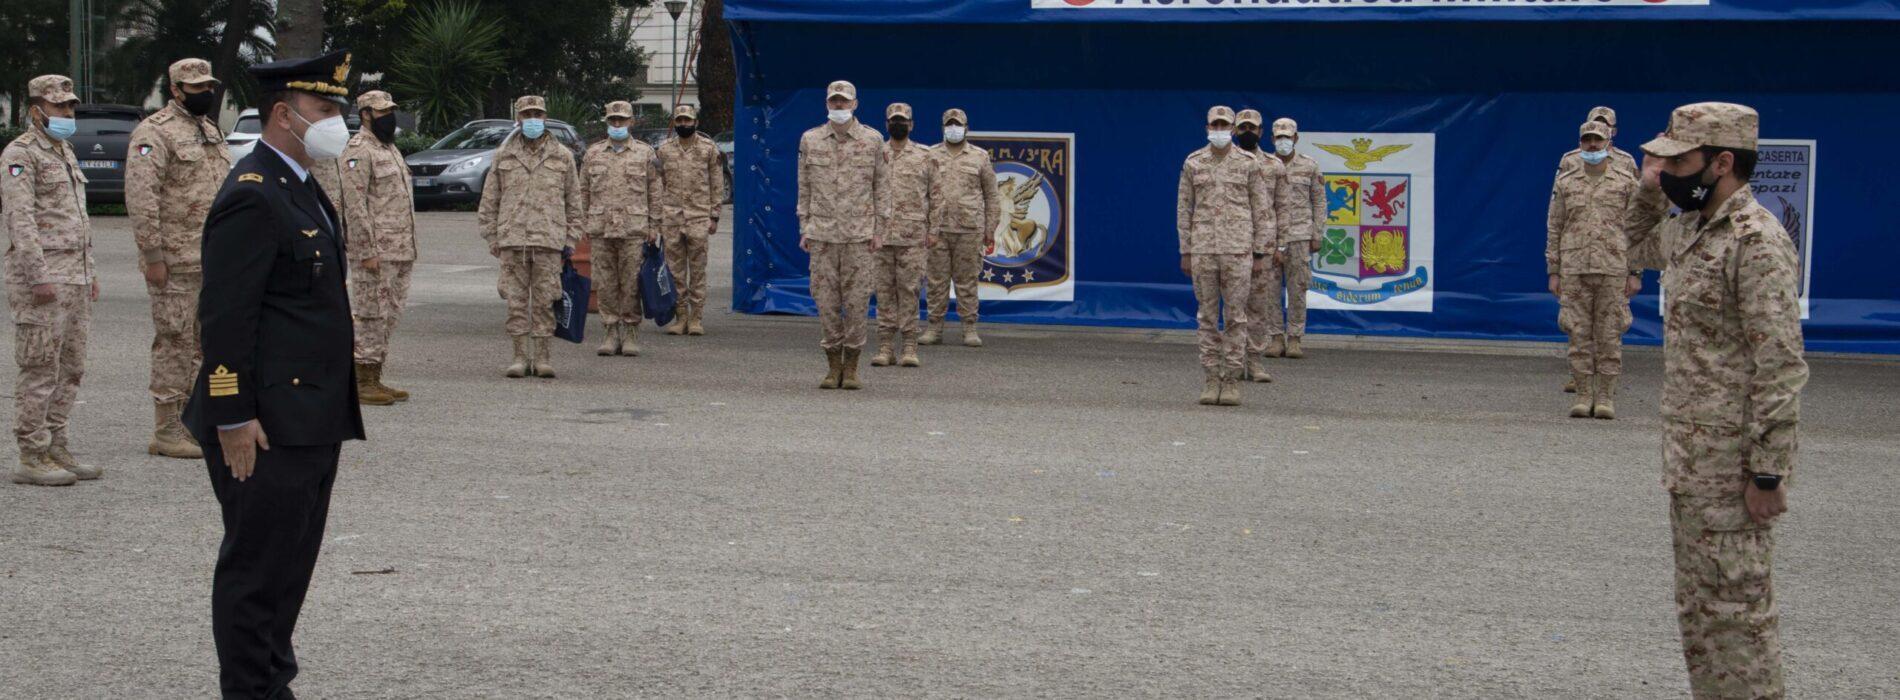 Aeronautica di Caserta, diplomati 31 frequentatori del Kuwait